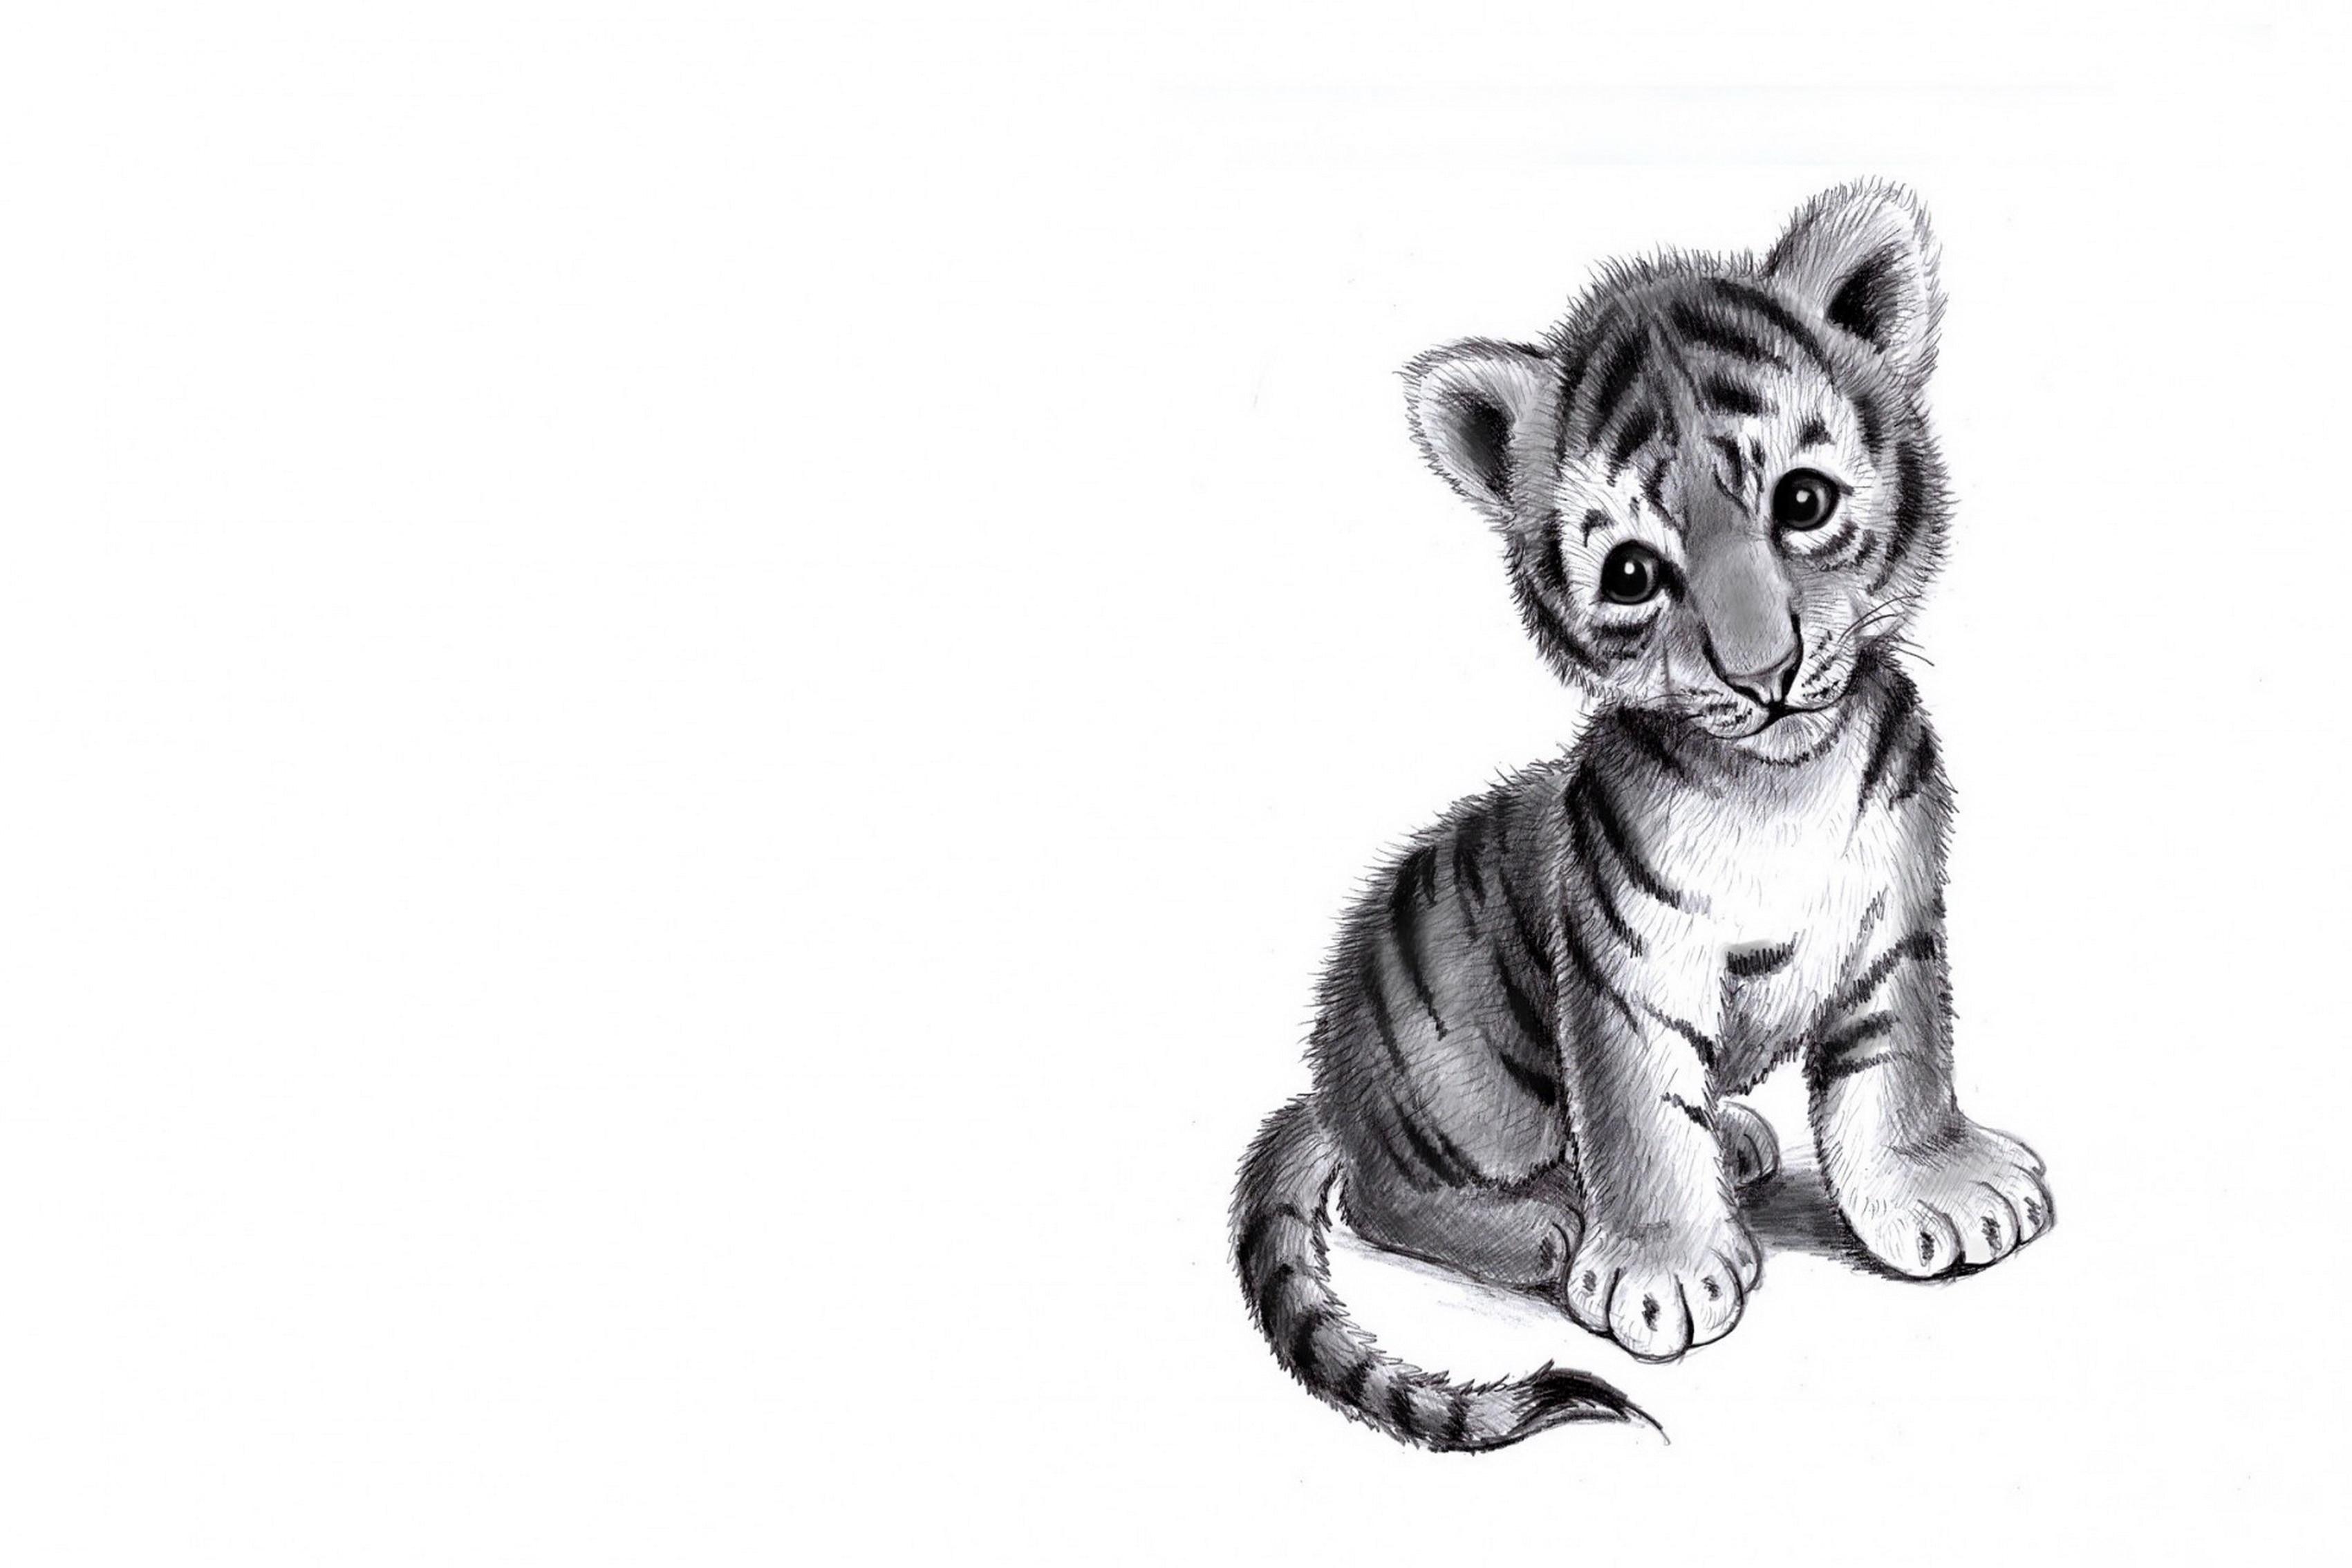 Baby tiger pencil drawing sad mood Living room home art decor wood ...